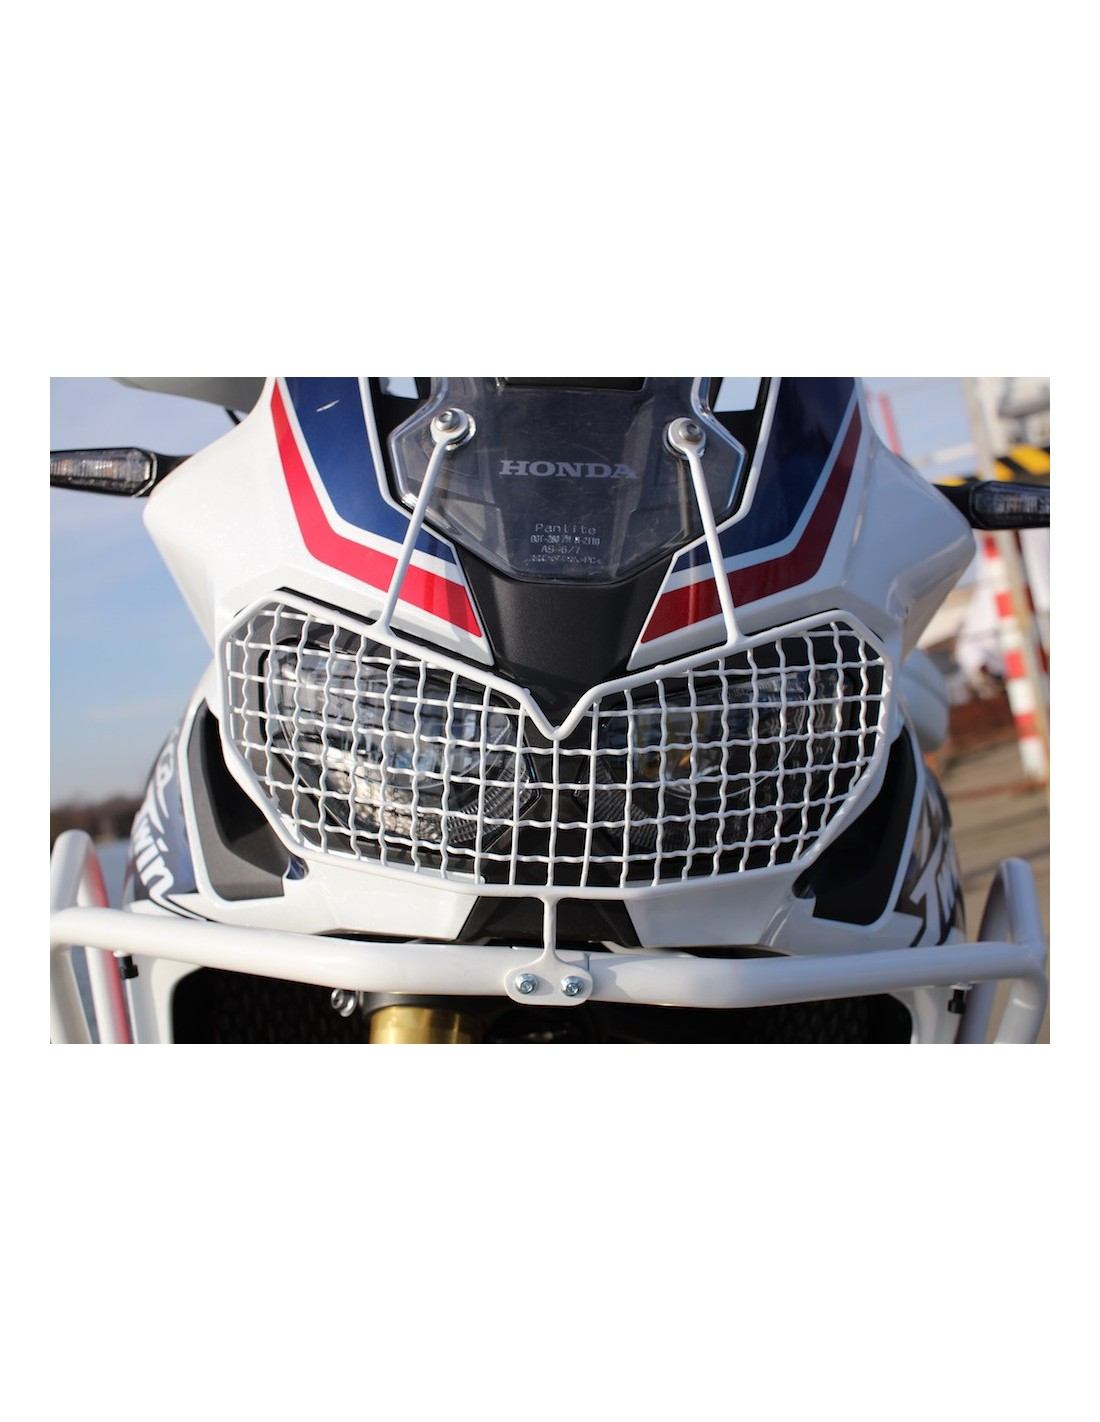 headlight-protector-for-africa-crf1000.jpg